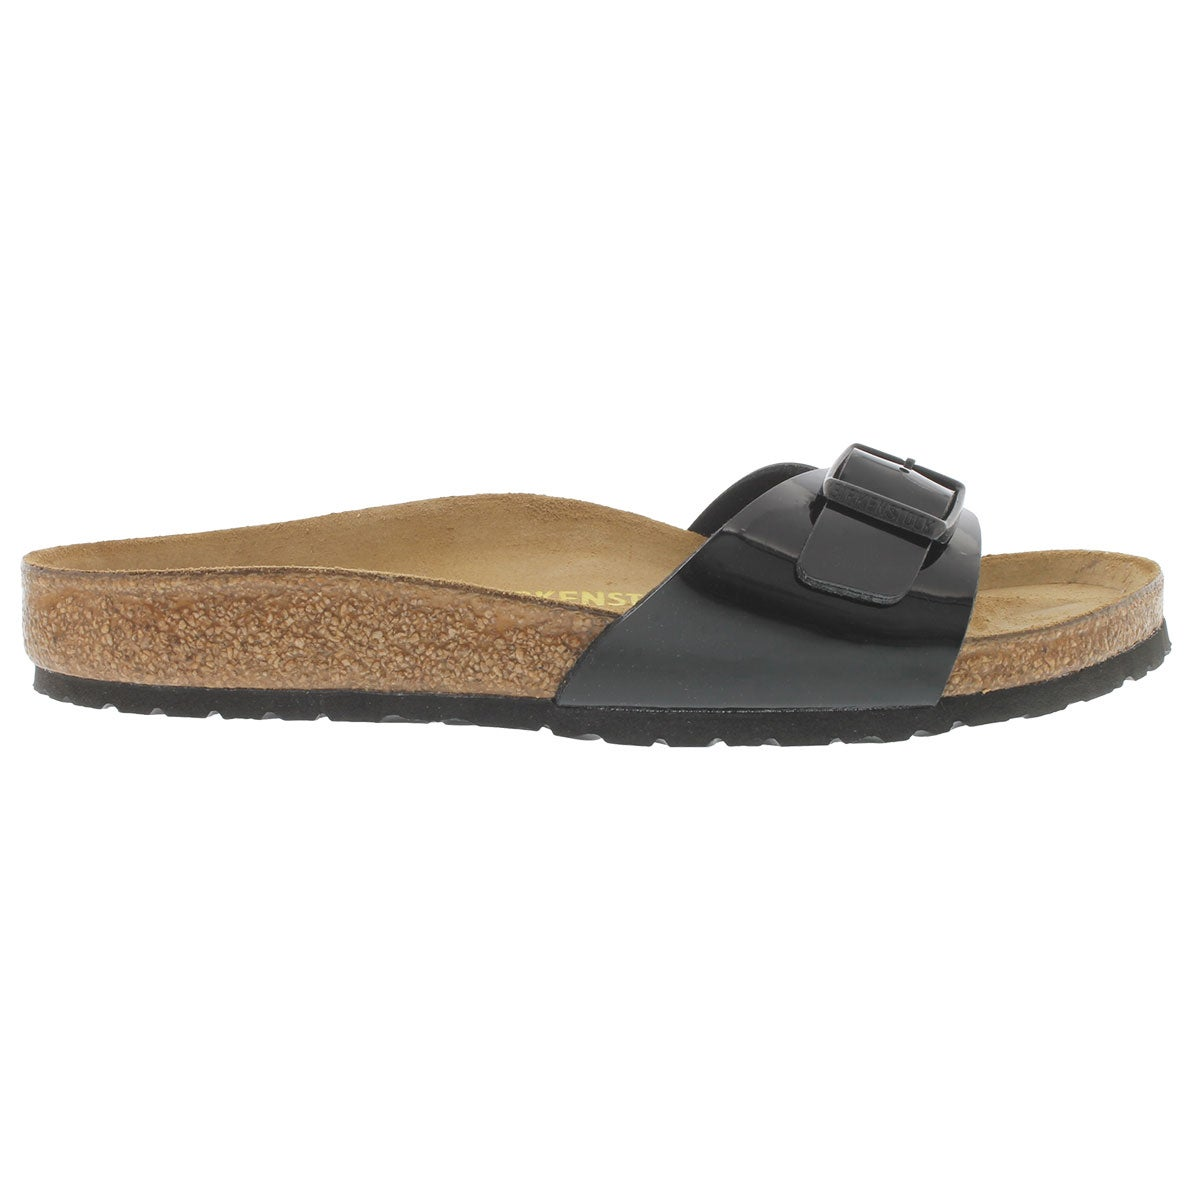 Lds Madrid black pat BF 1 strap sandal